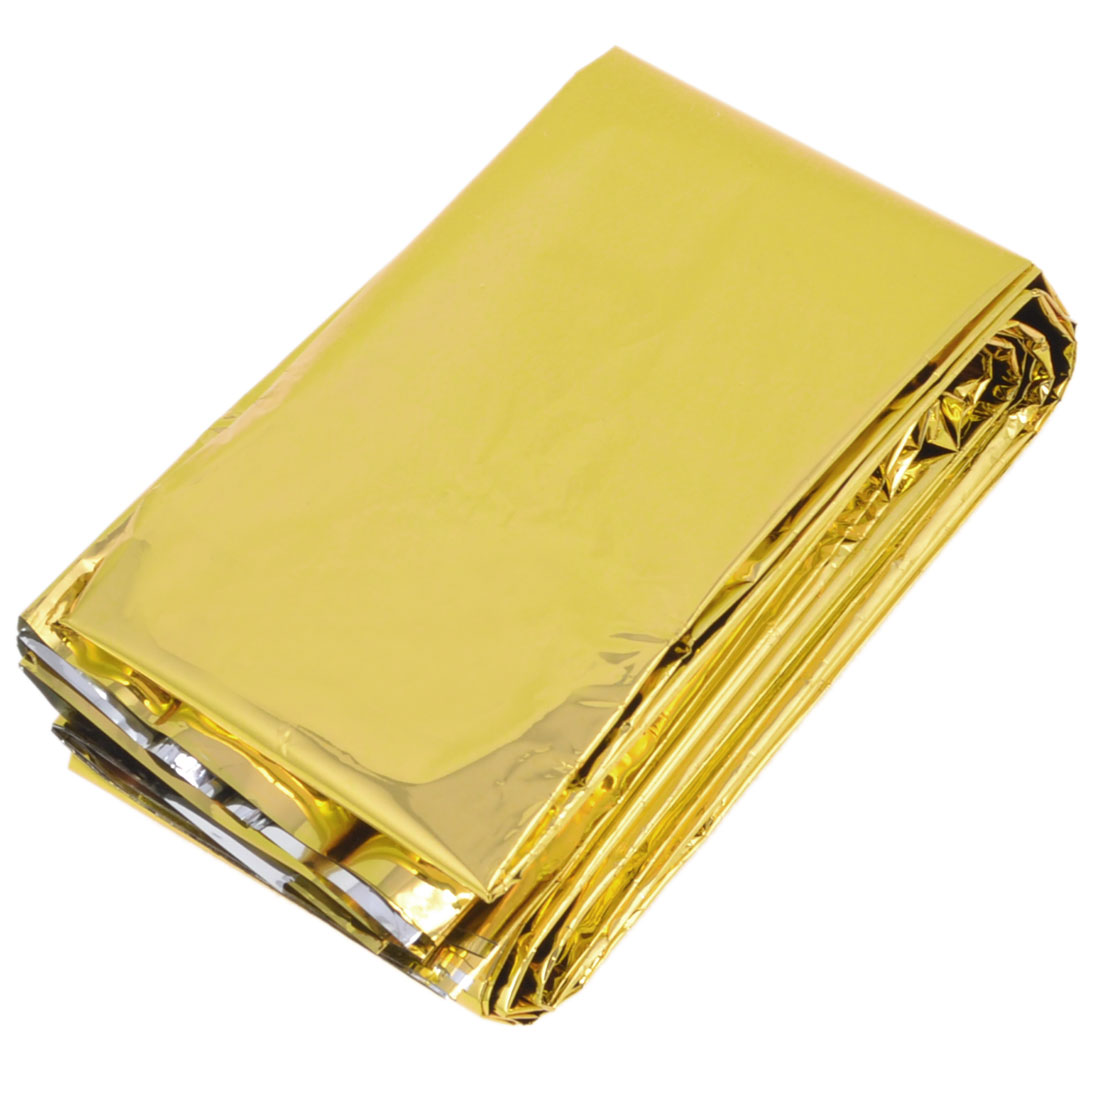 Outdoor Rescue Solar Warming Mylar Emergency Blanket 2.1M x 1.4M Gold Tone